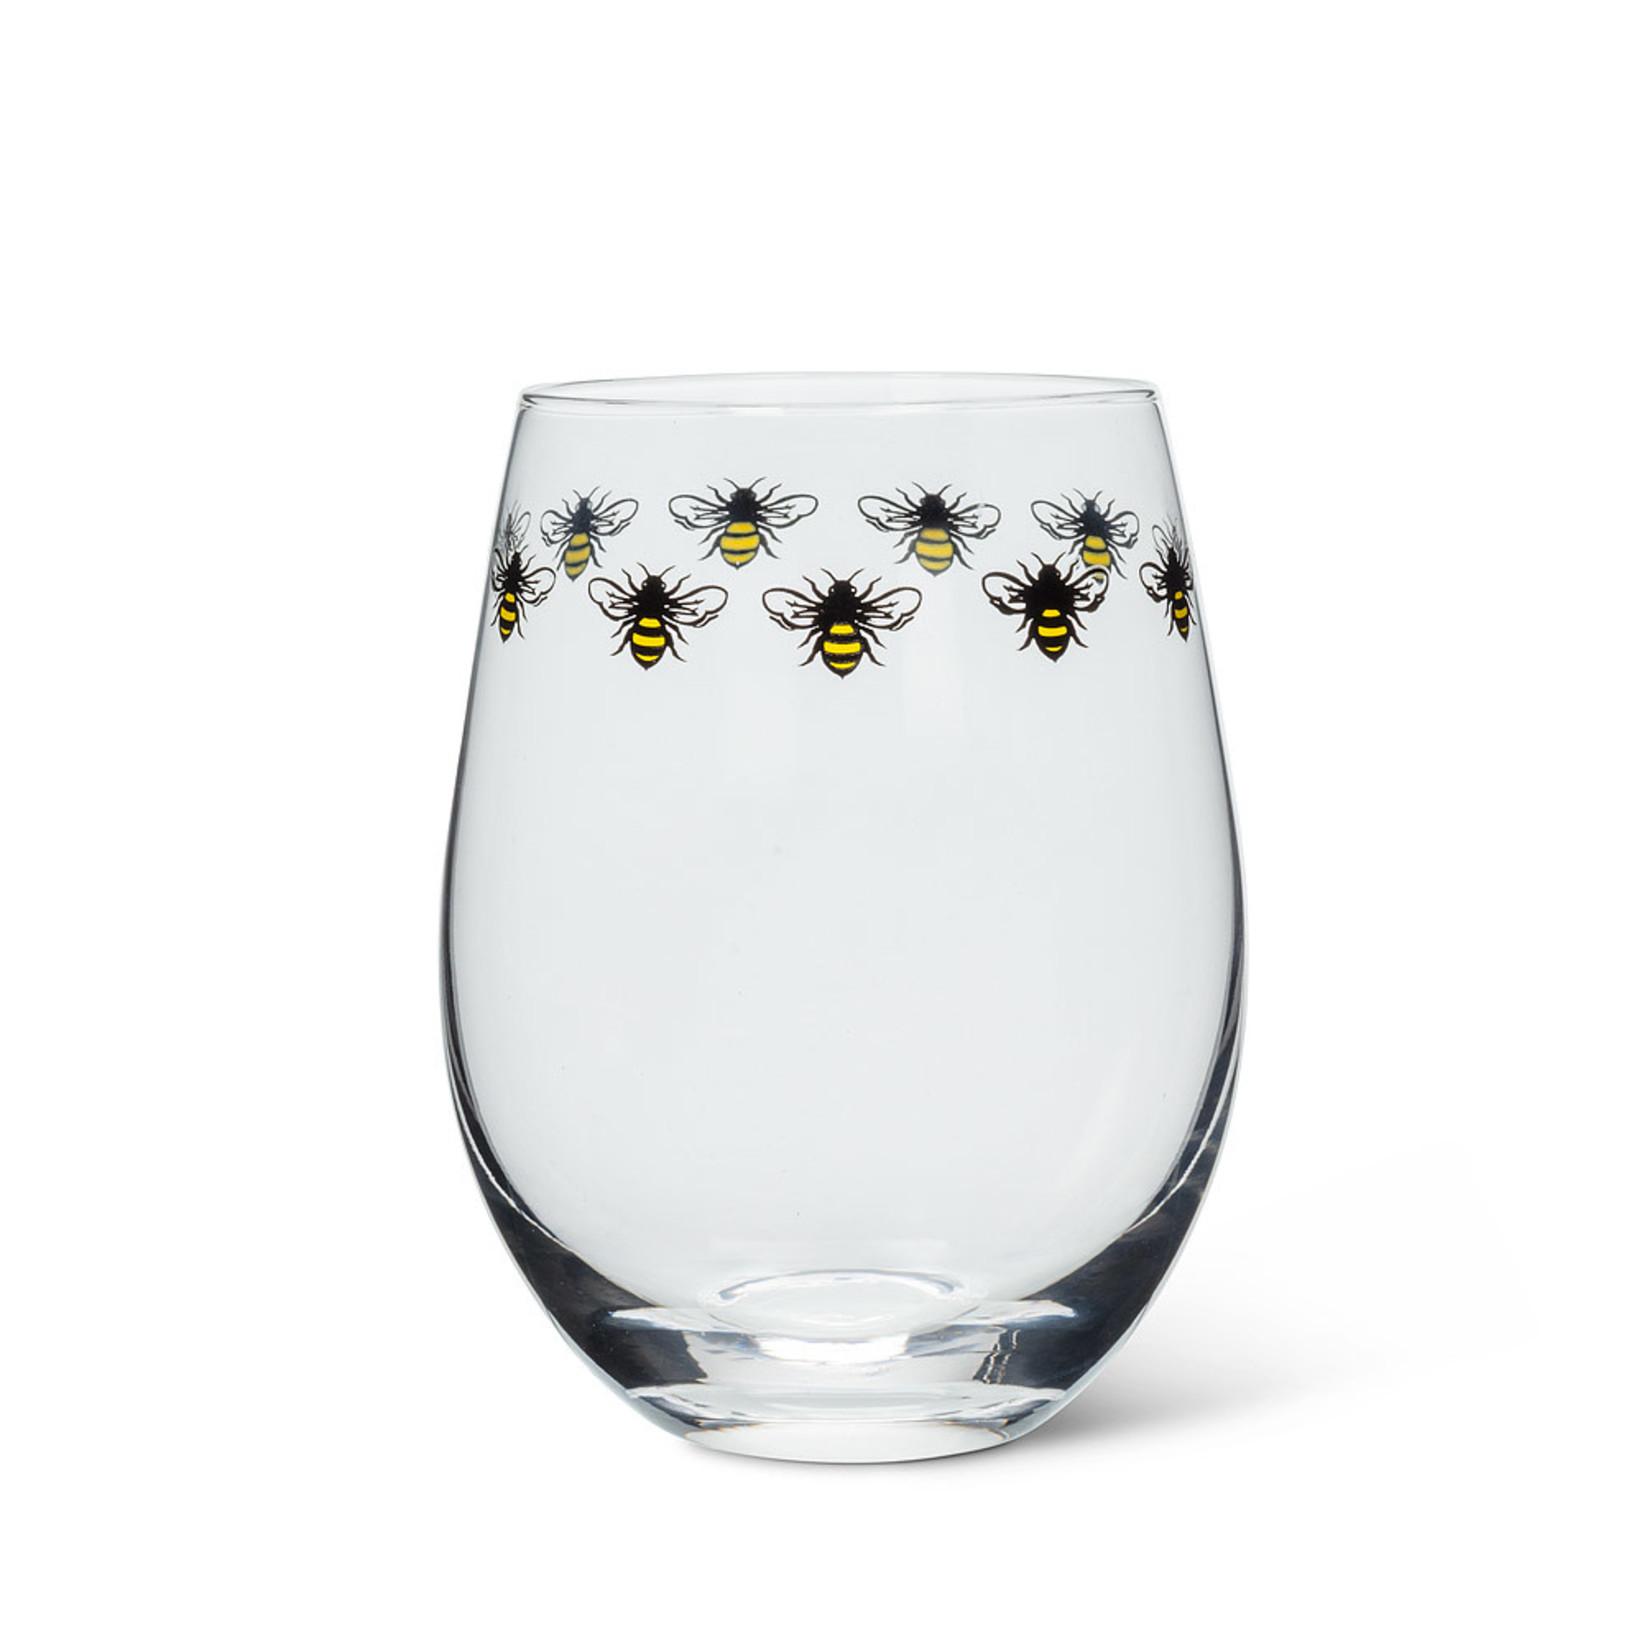 Bee Stemless Glass Goblet - 14 oz.